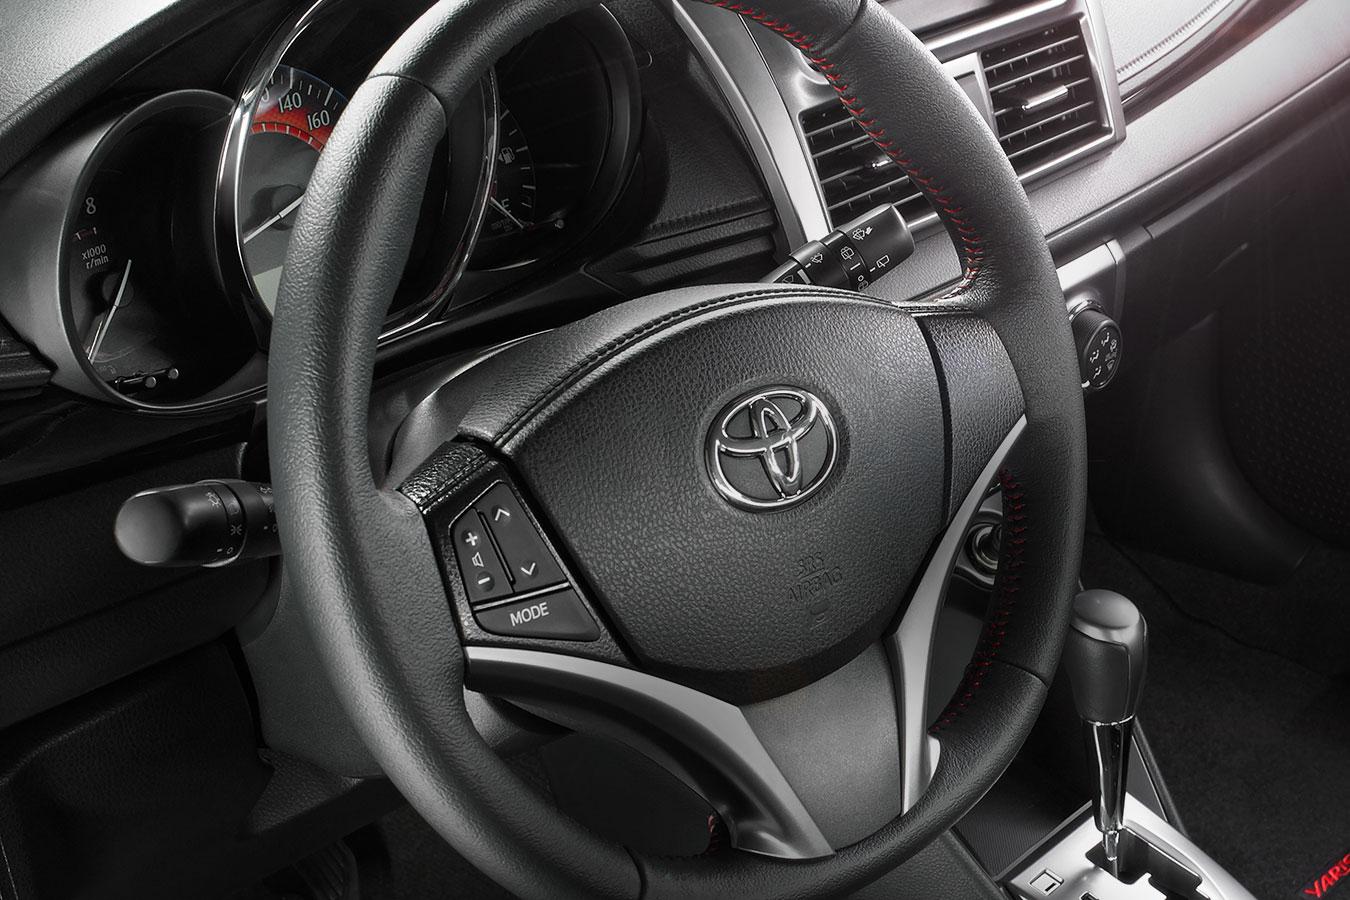 Toyota Yaris Hatchback 2017 en México volante con controles